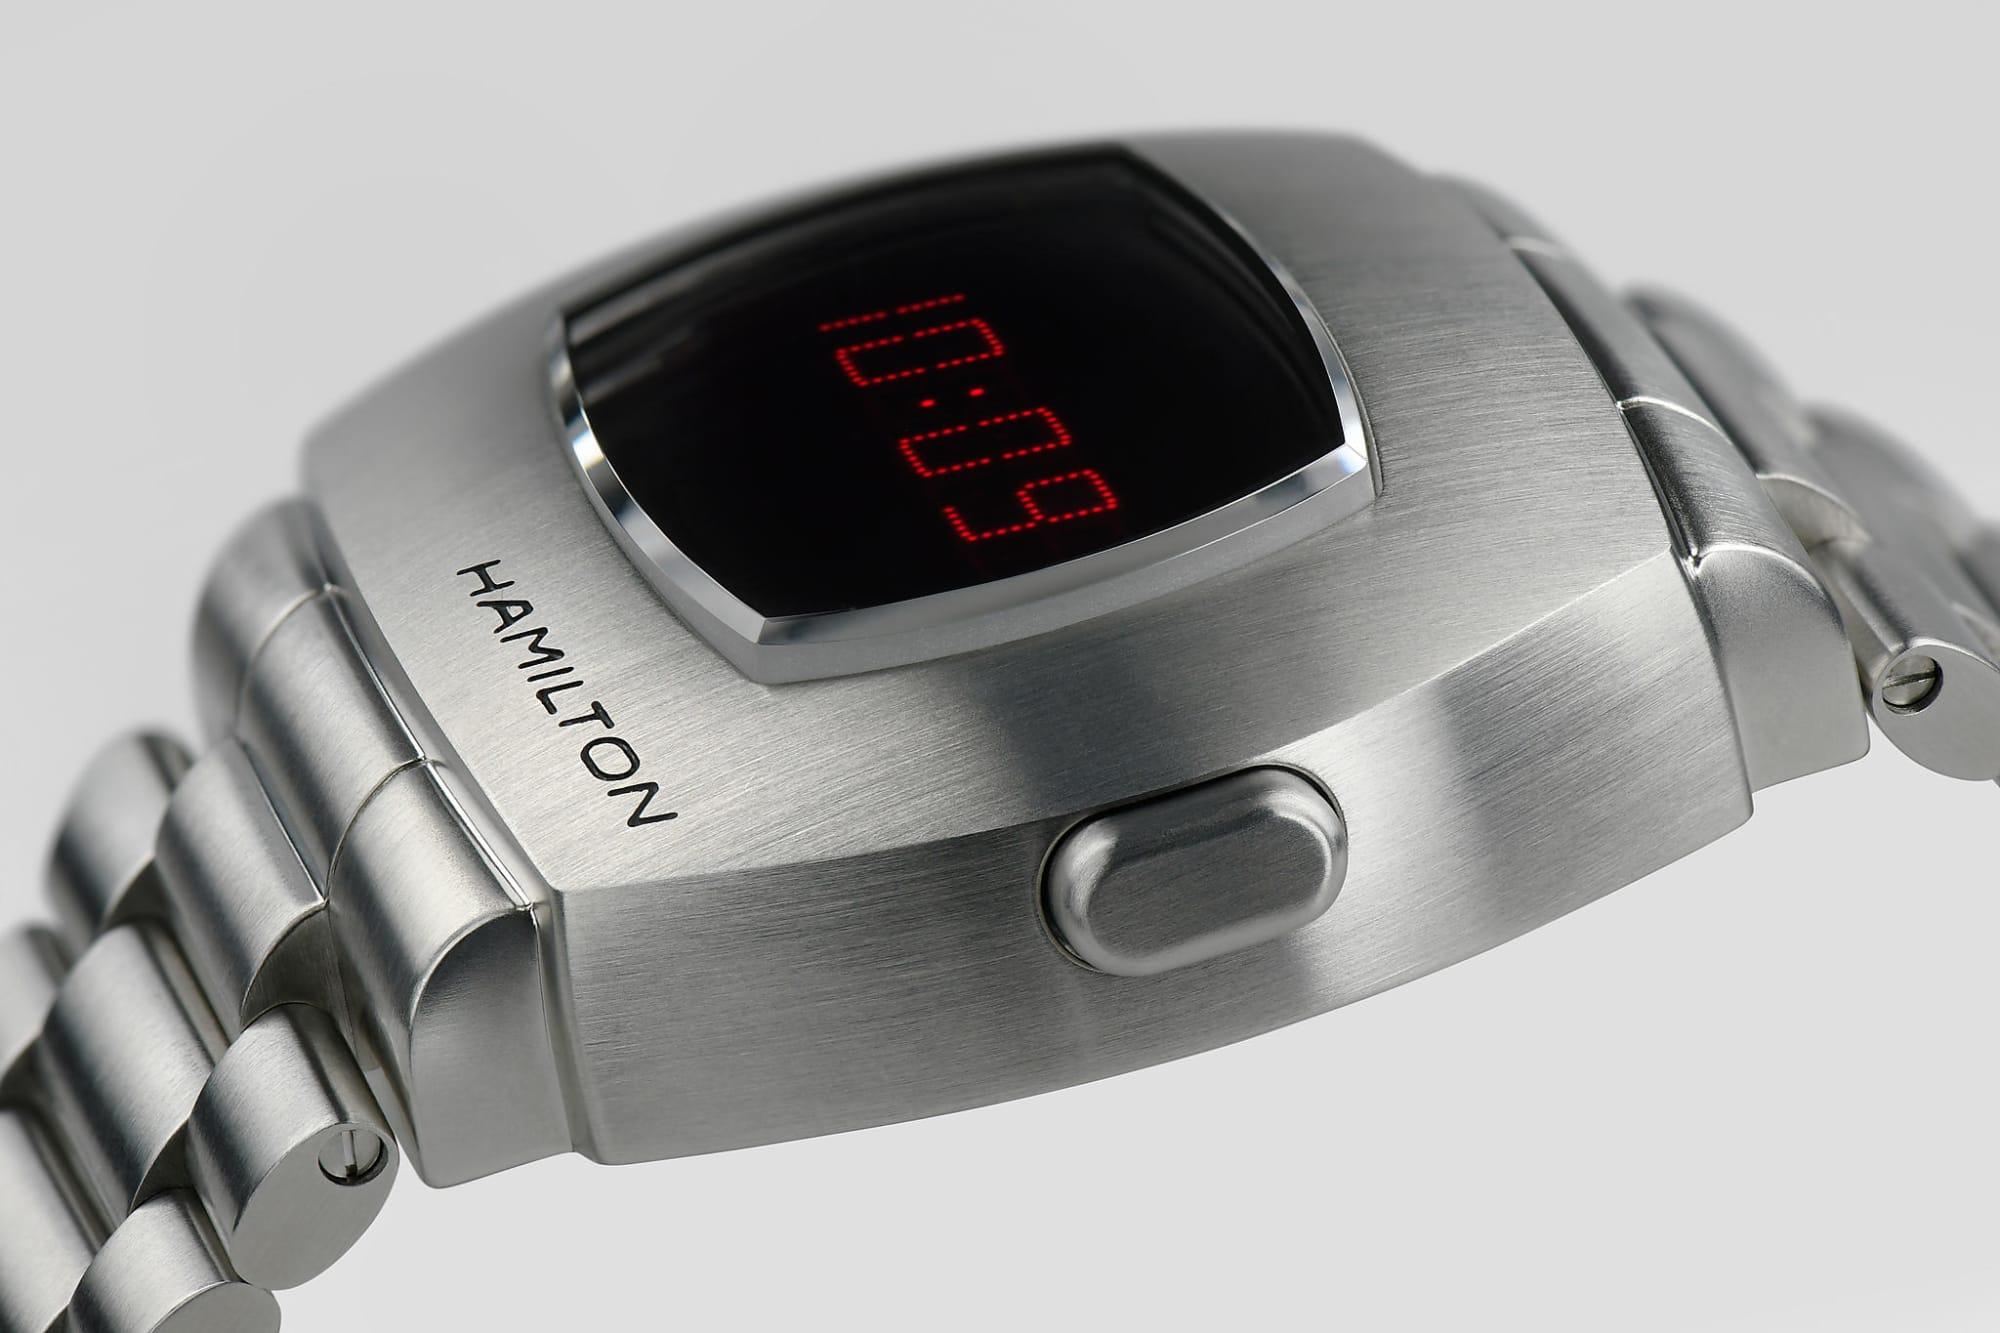 hamilton psr, pulsar, eerste digitale horloge, 1970, heruitgave